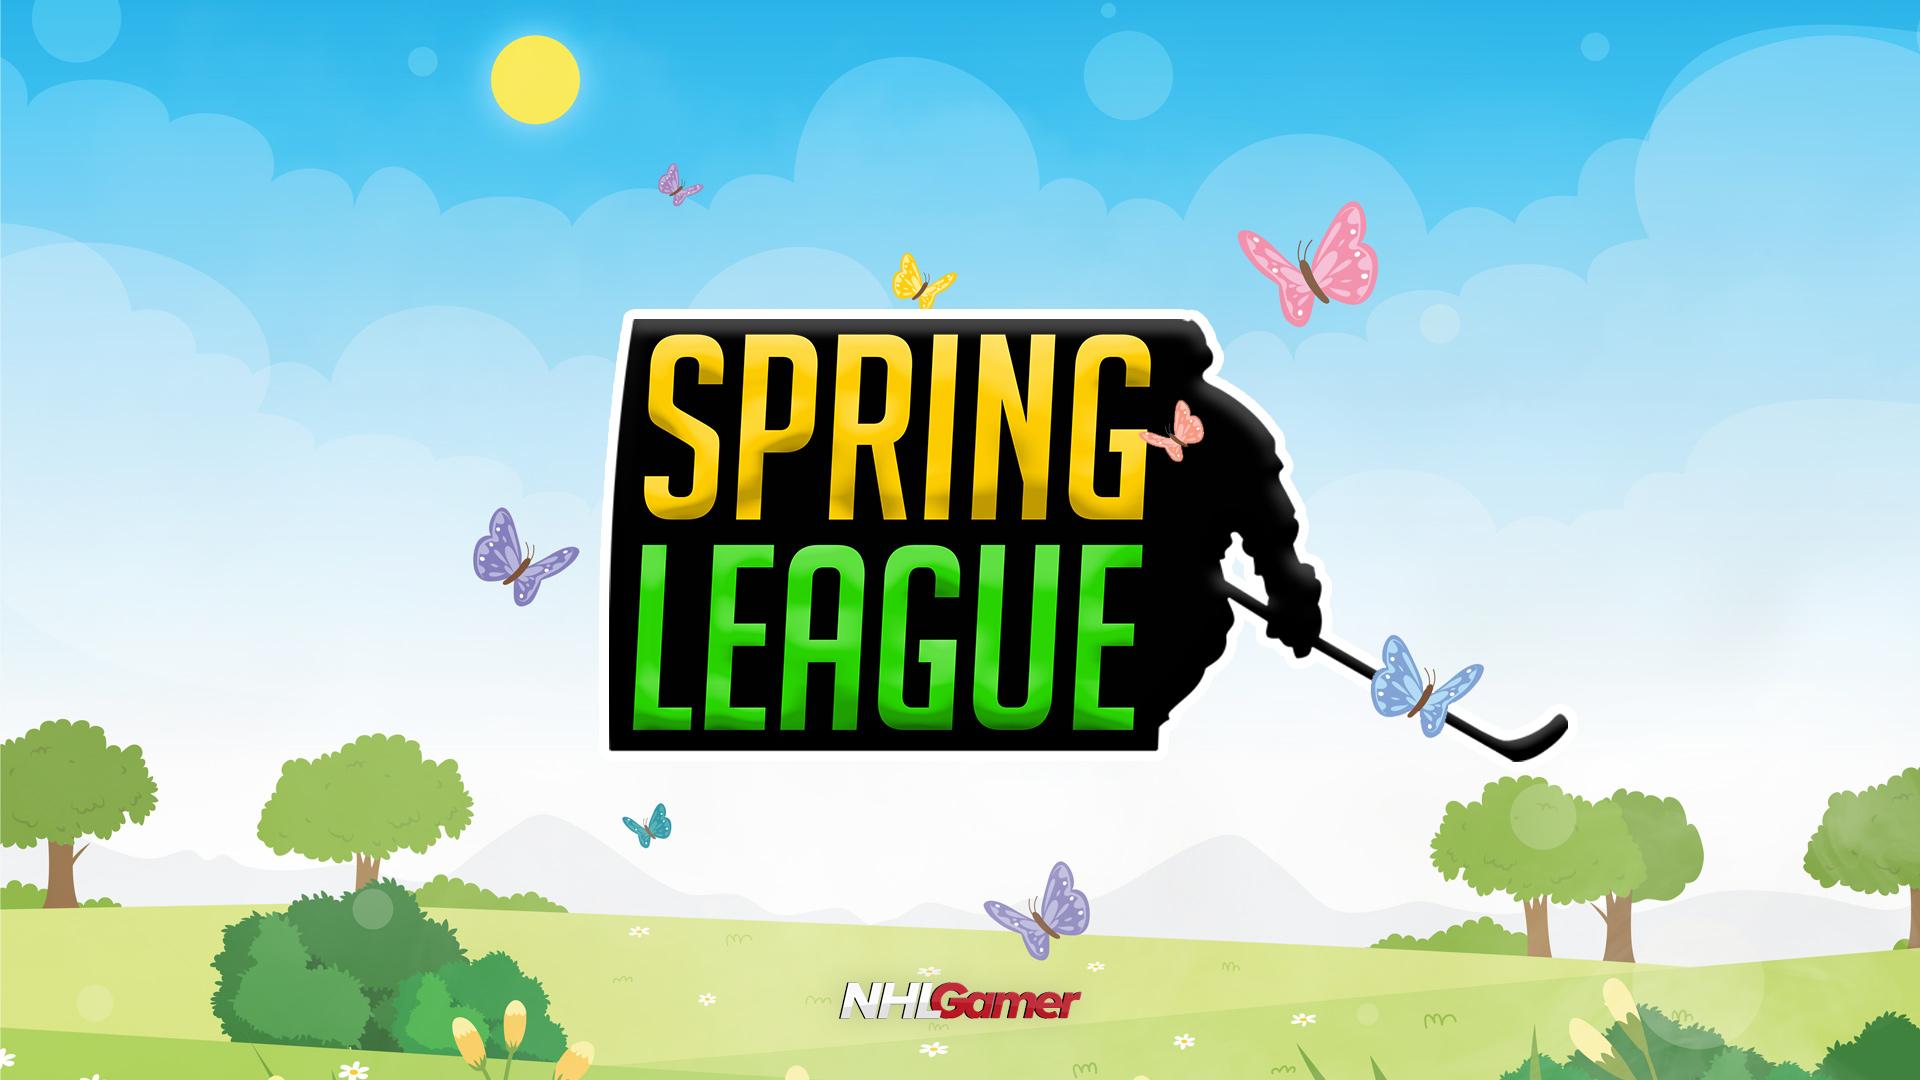 Spring_League_poster.jpg